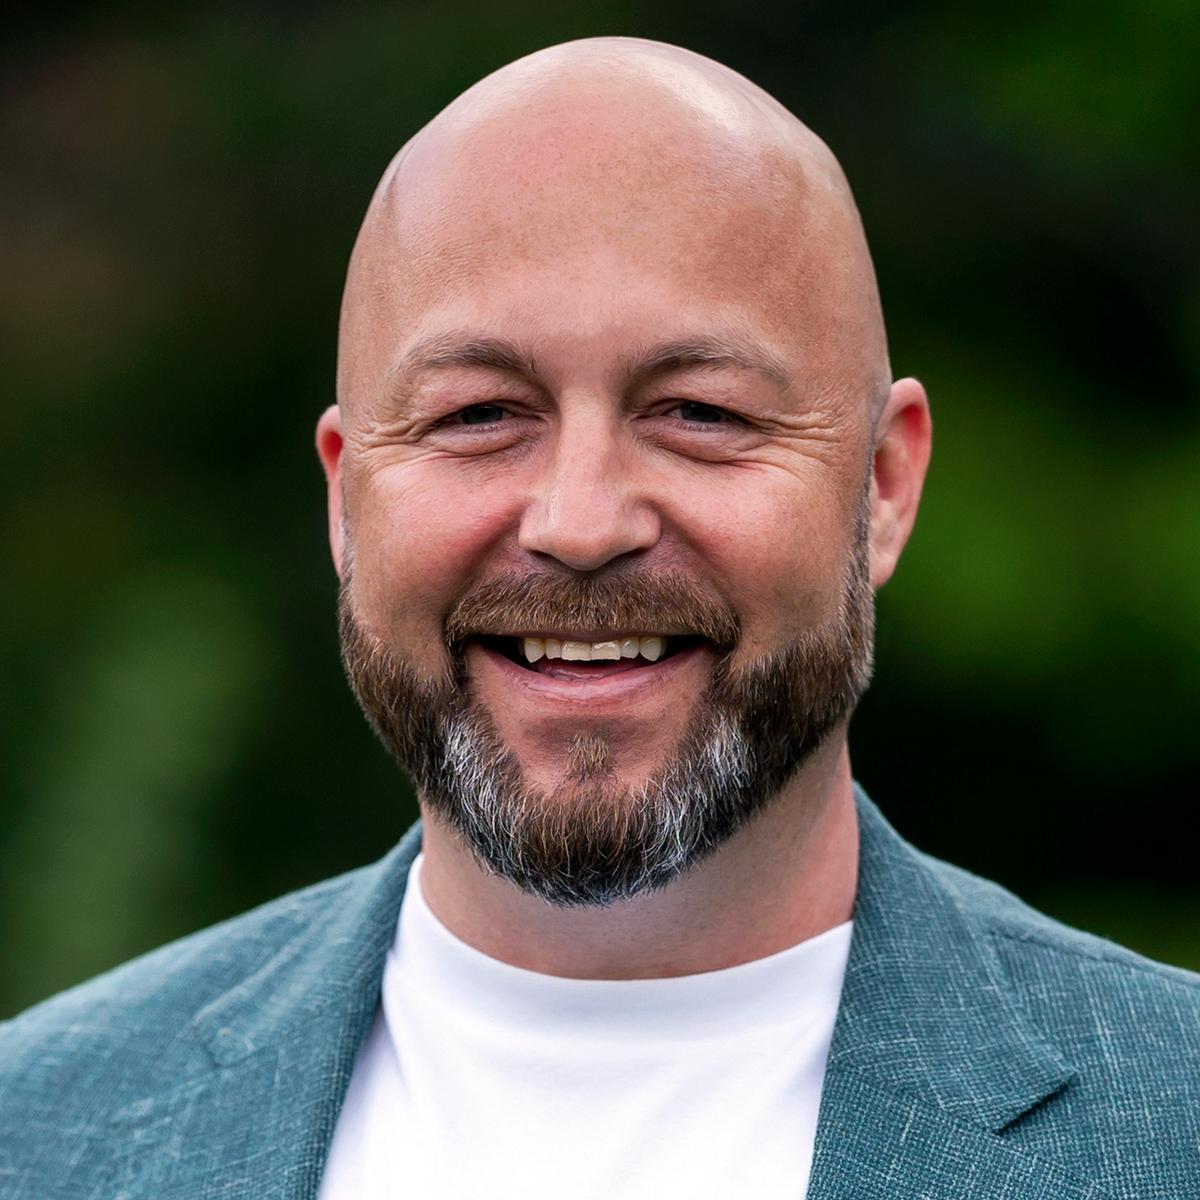 Frank Victor Valderhaugstrand Gründer i B2B ARENA AS